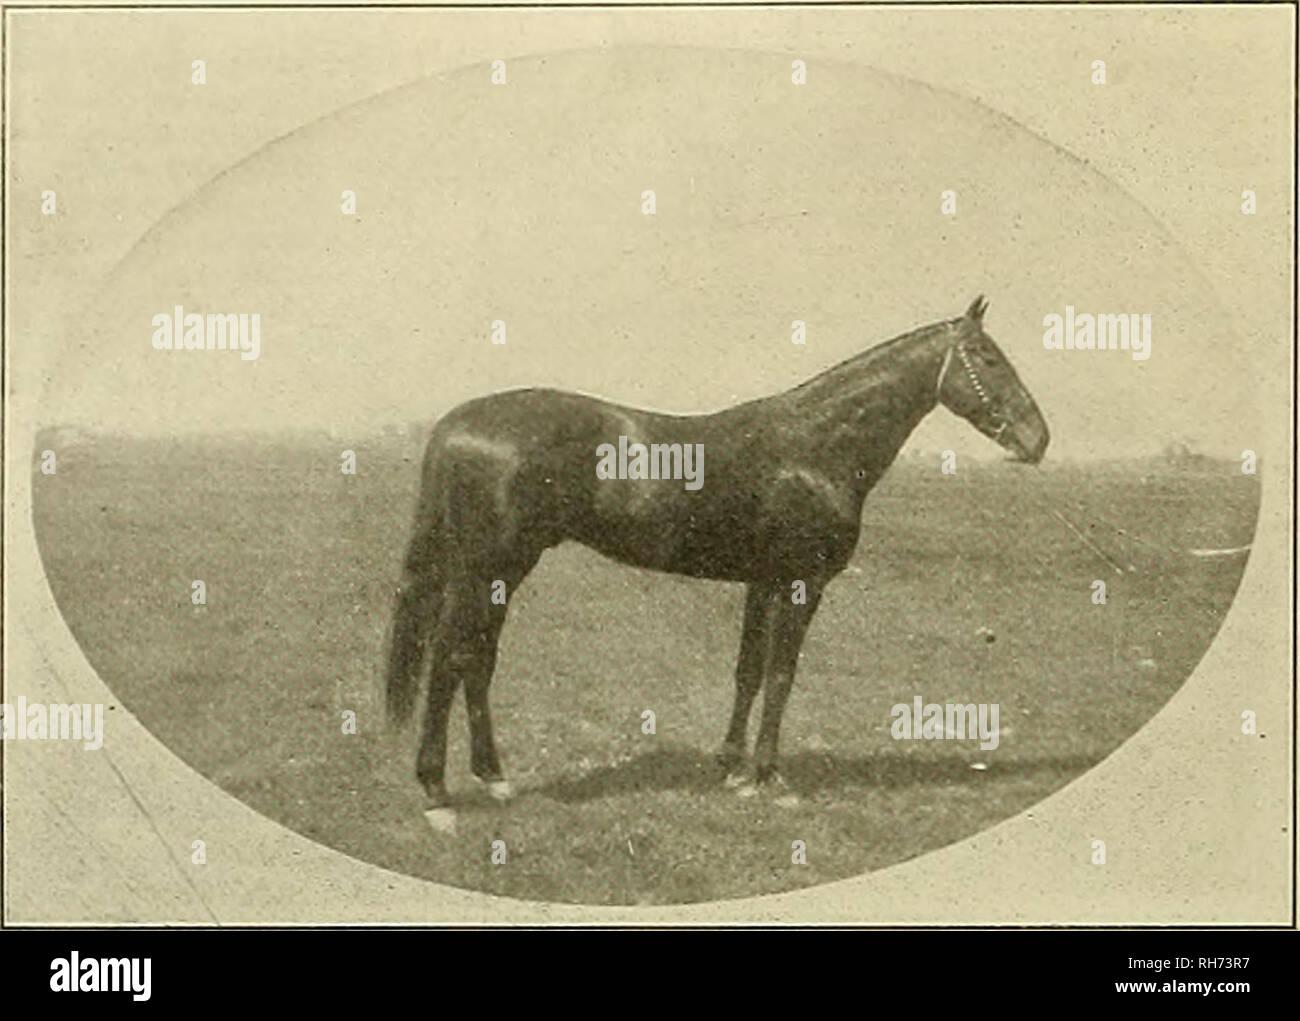 Pre 1906 Stock Photos & Pre 1906 Stock Images - Alamy